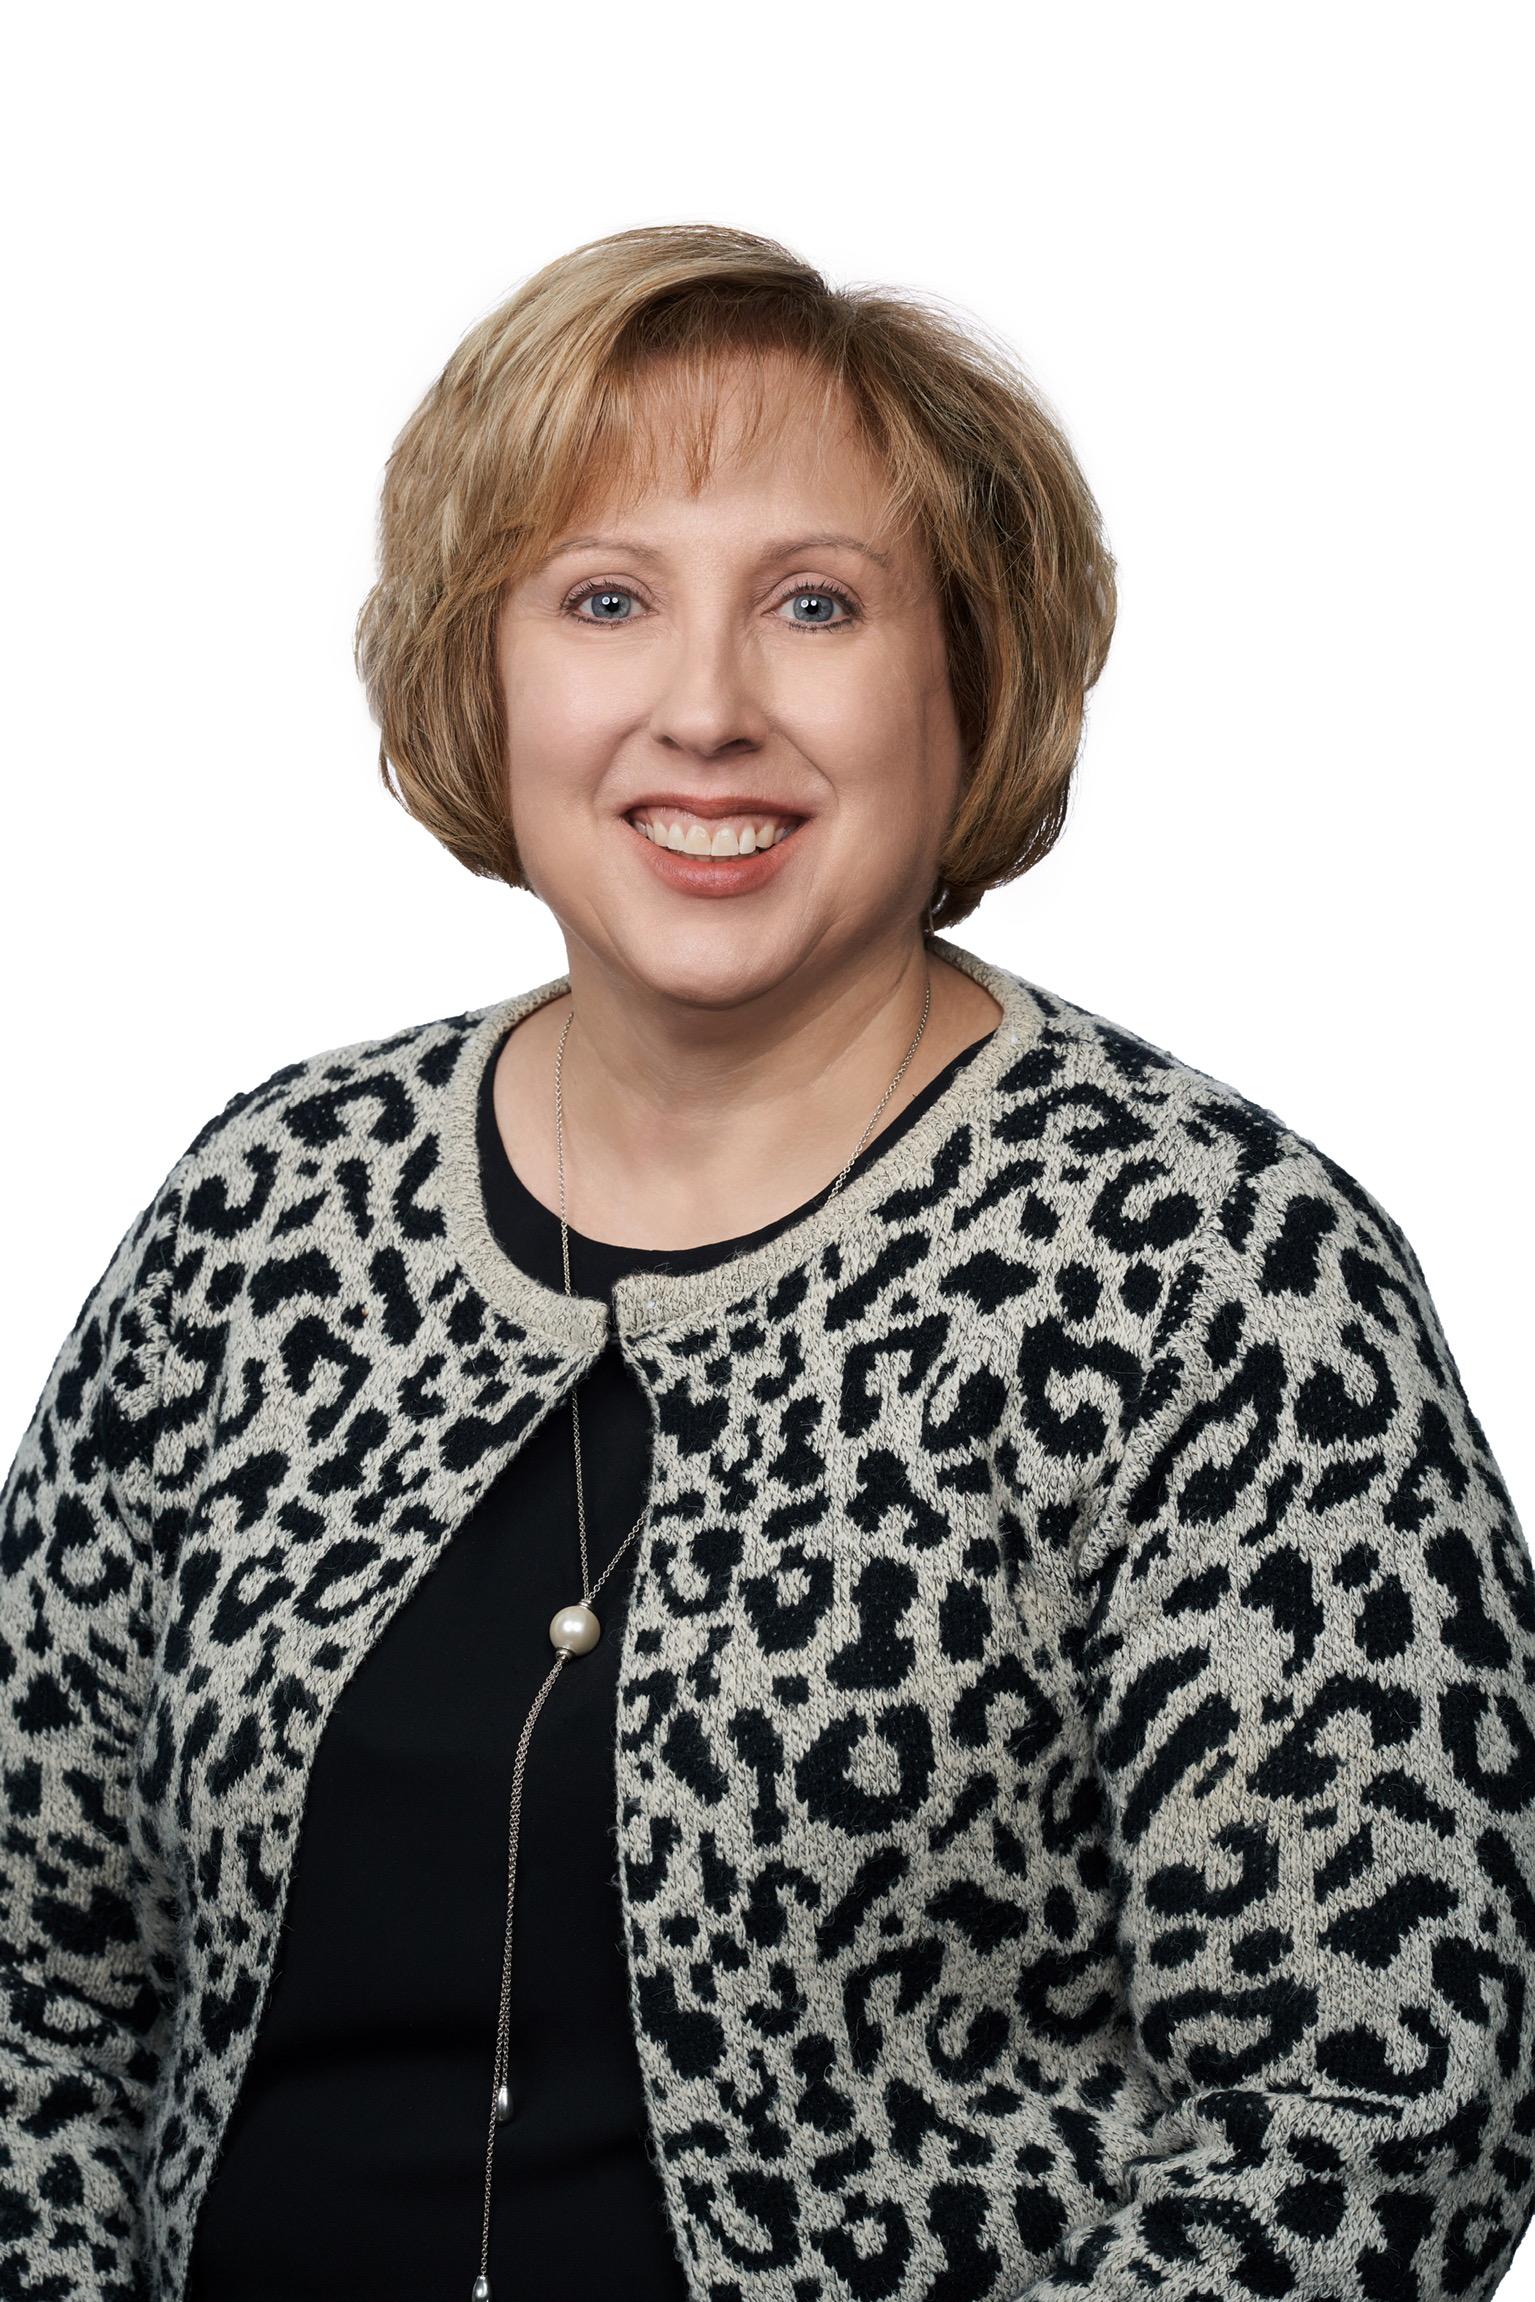 Liz Skolaski